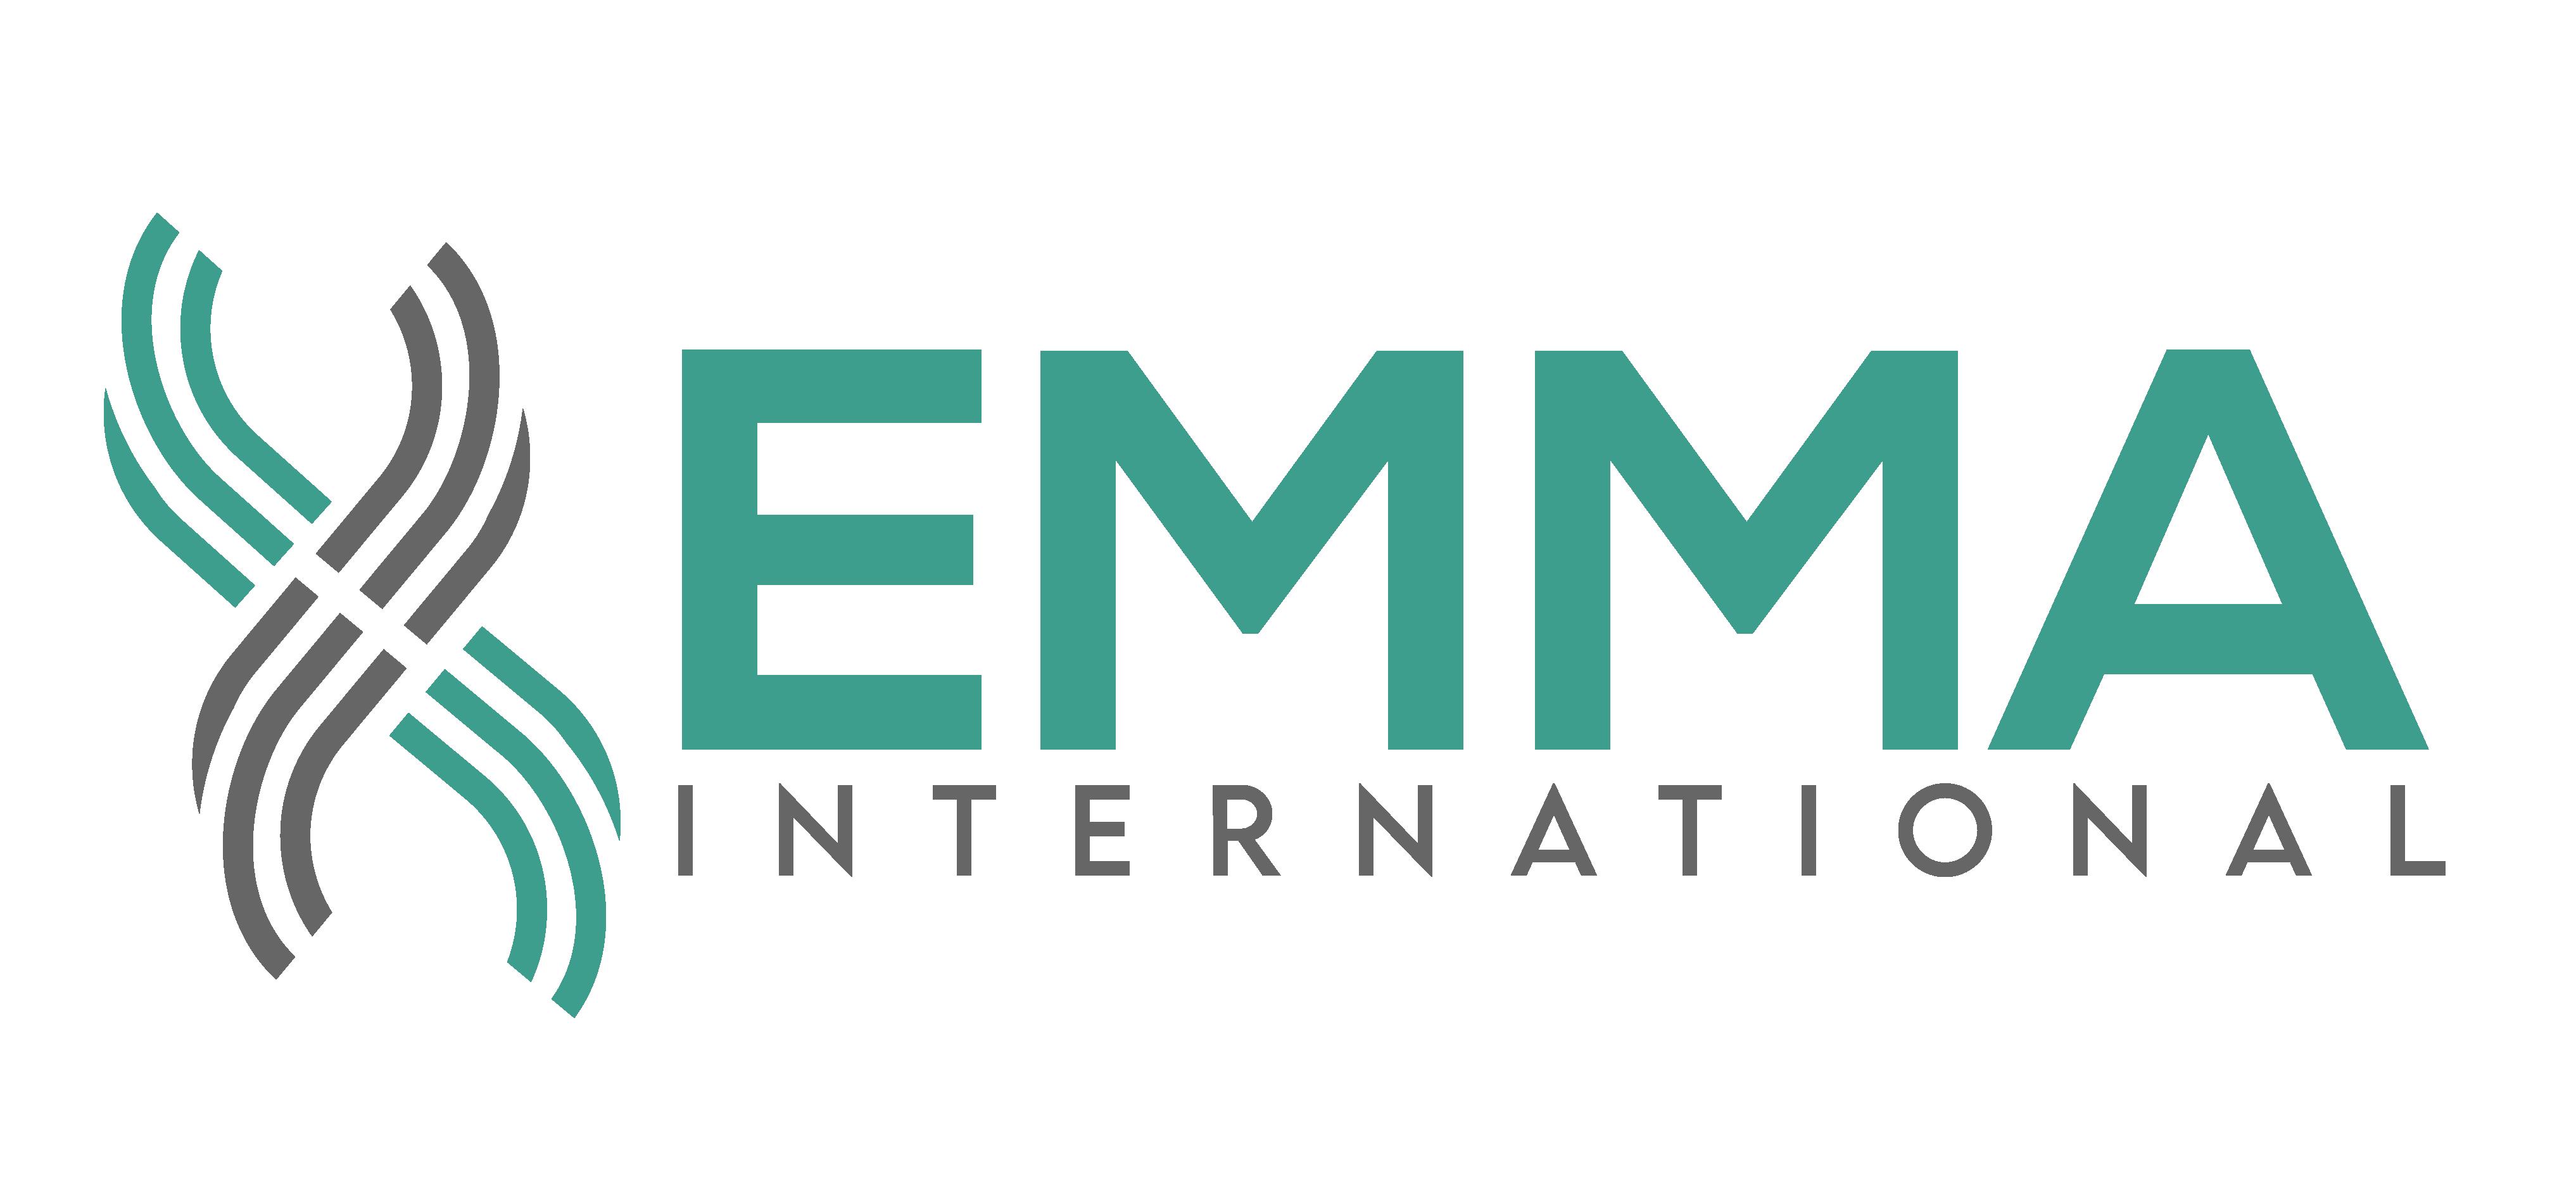 EMMA Logo 2021